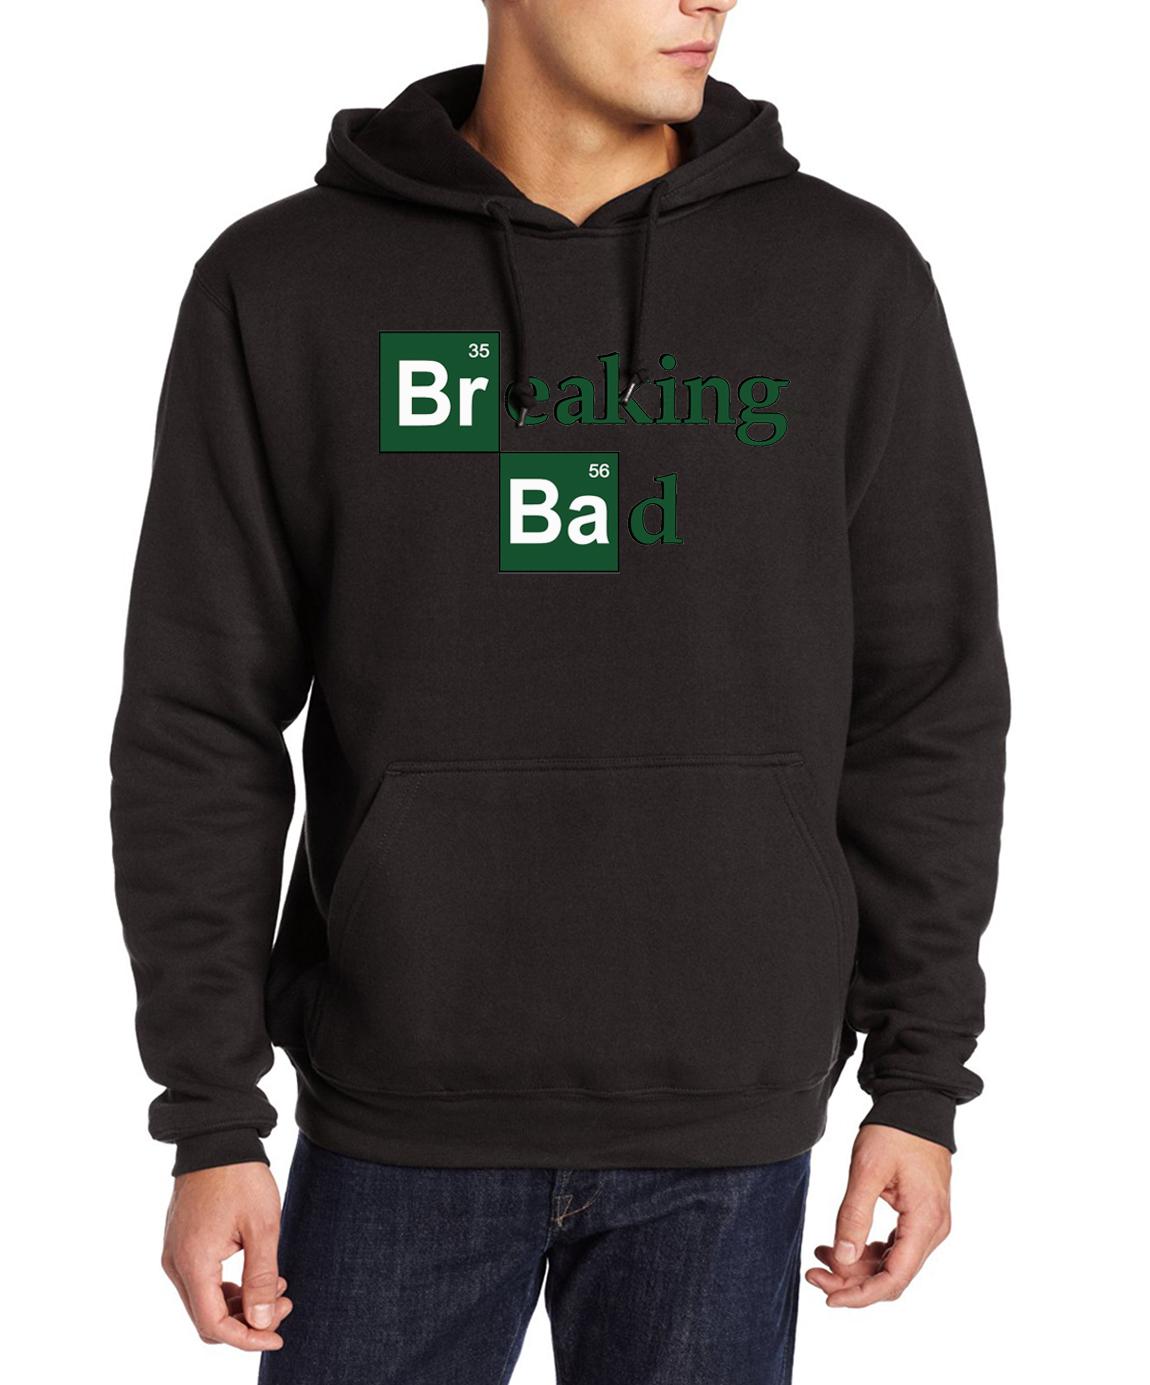 Men fashion BREAKING BAD hip-hop pullovers 2017 hipster fitness sweatshirts male new fleece hoodies harajuku brand tracksuits pp(China (Mainland))